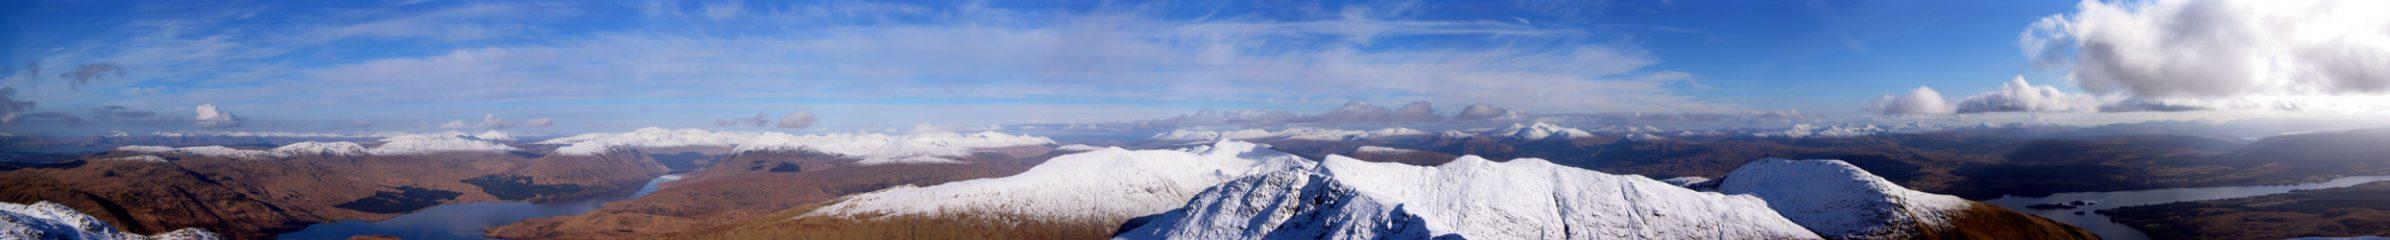 Summit view, Ben Cruachan